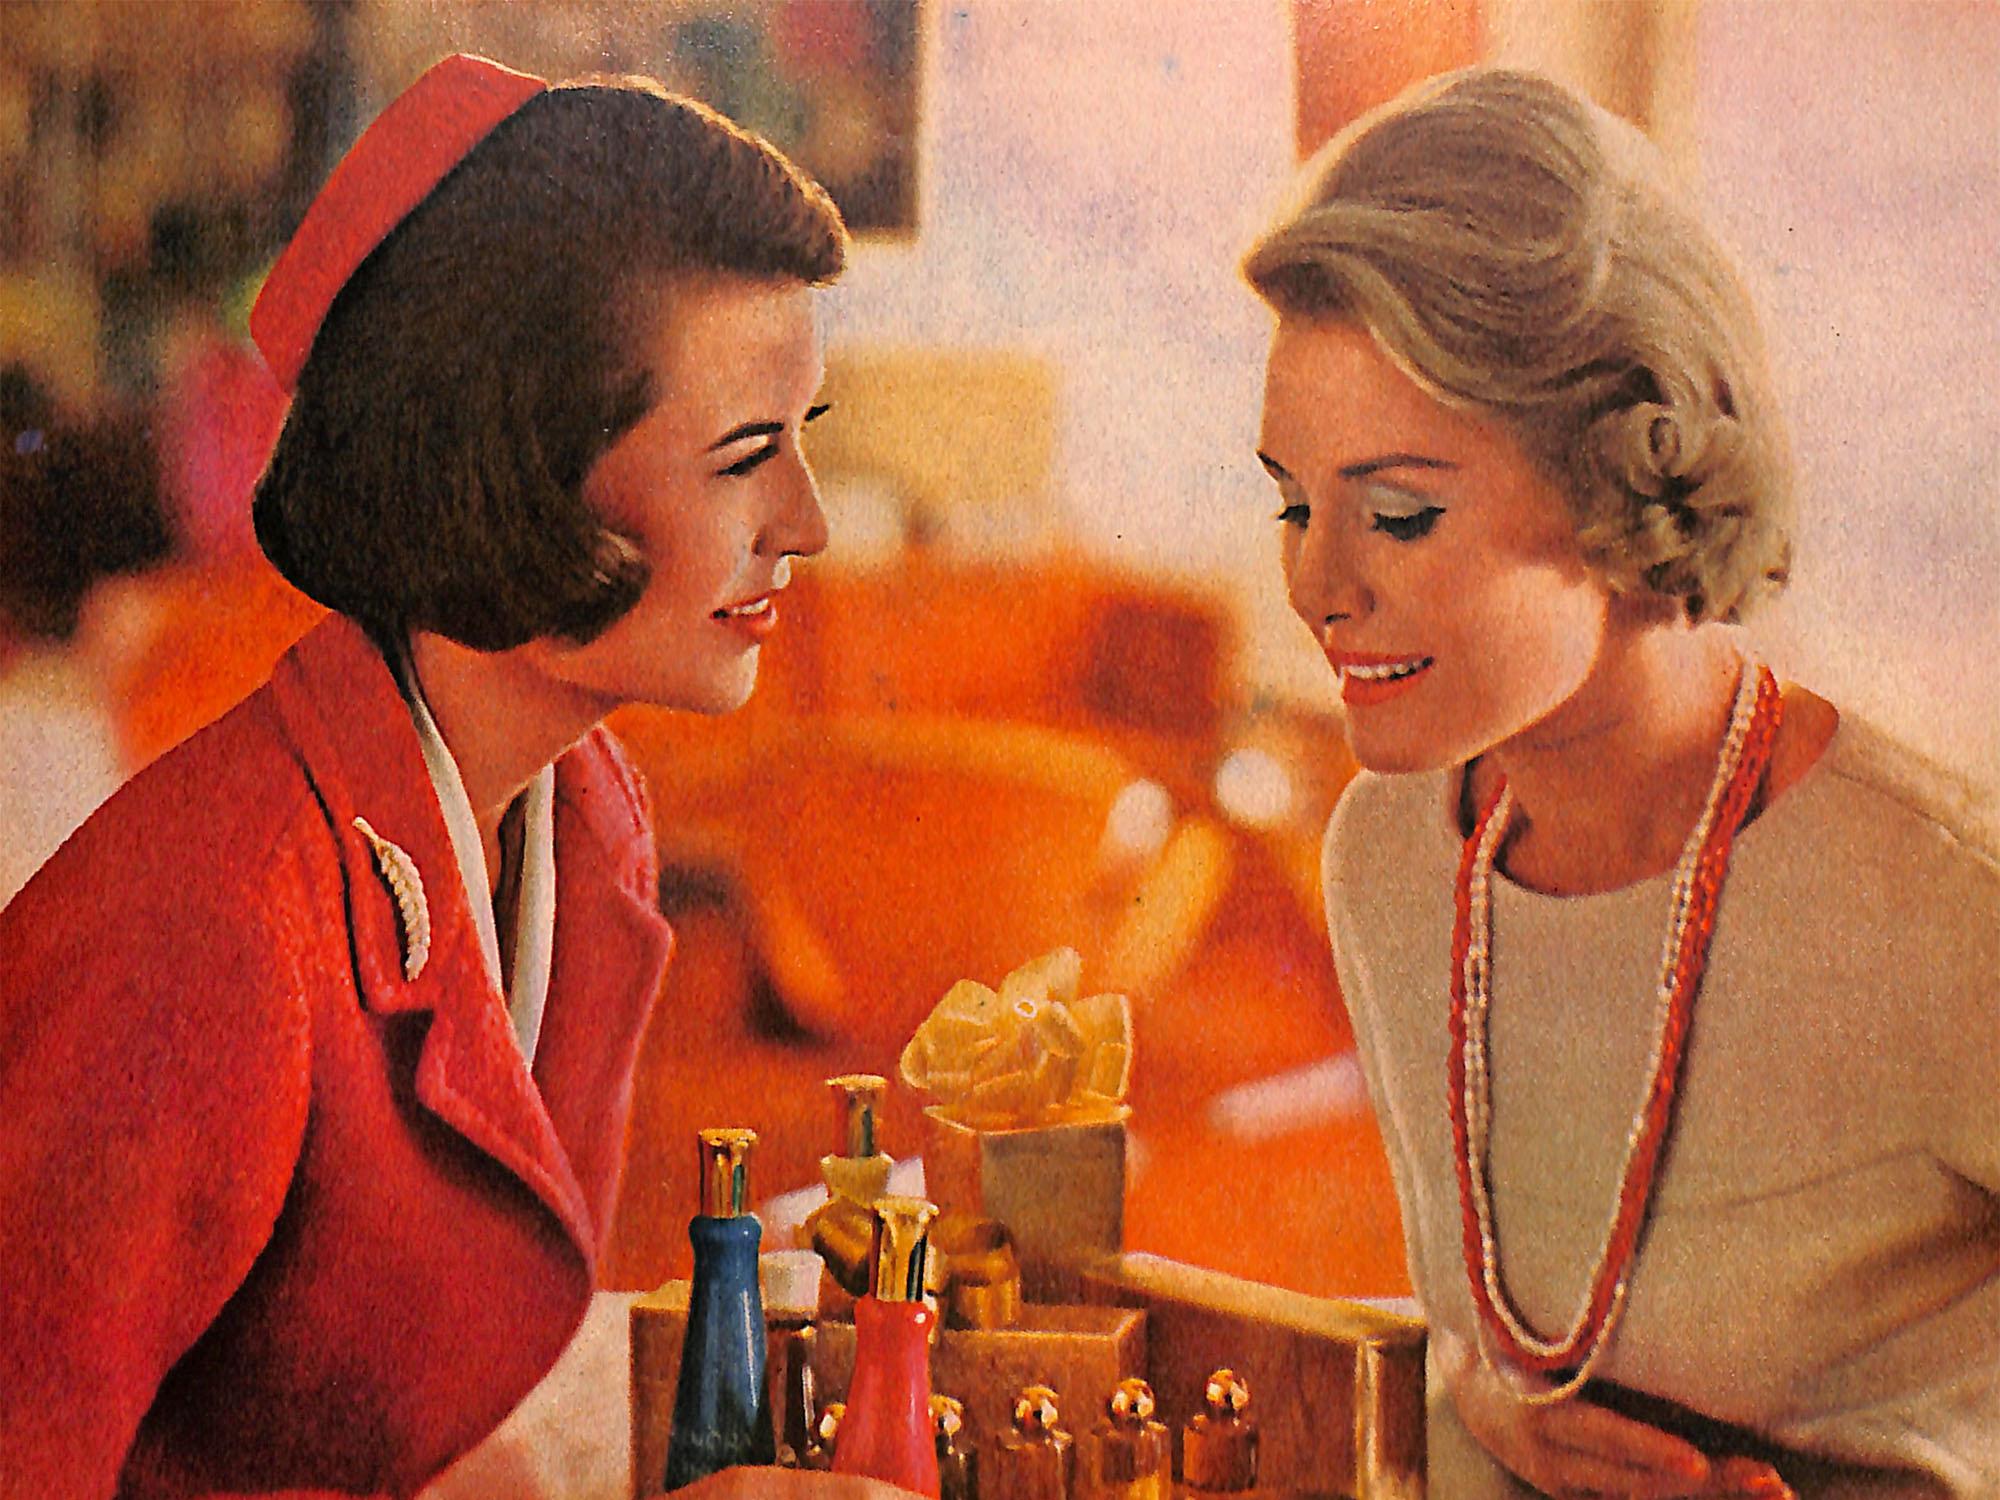 1963 Hollywood cosmetics